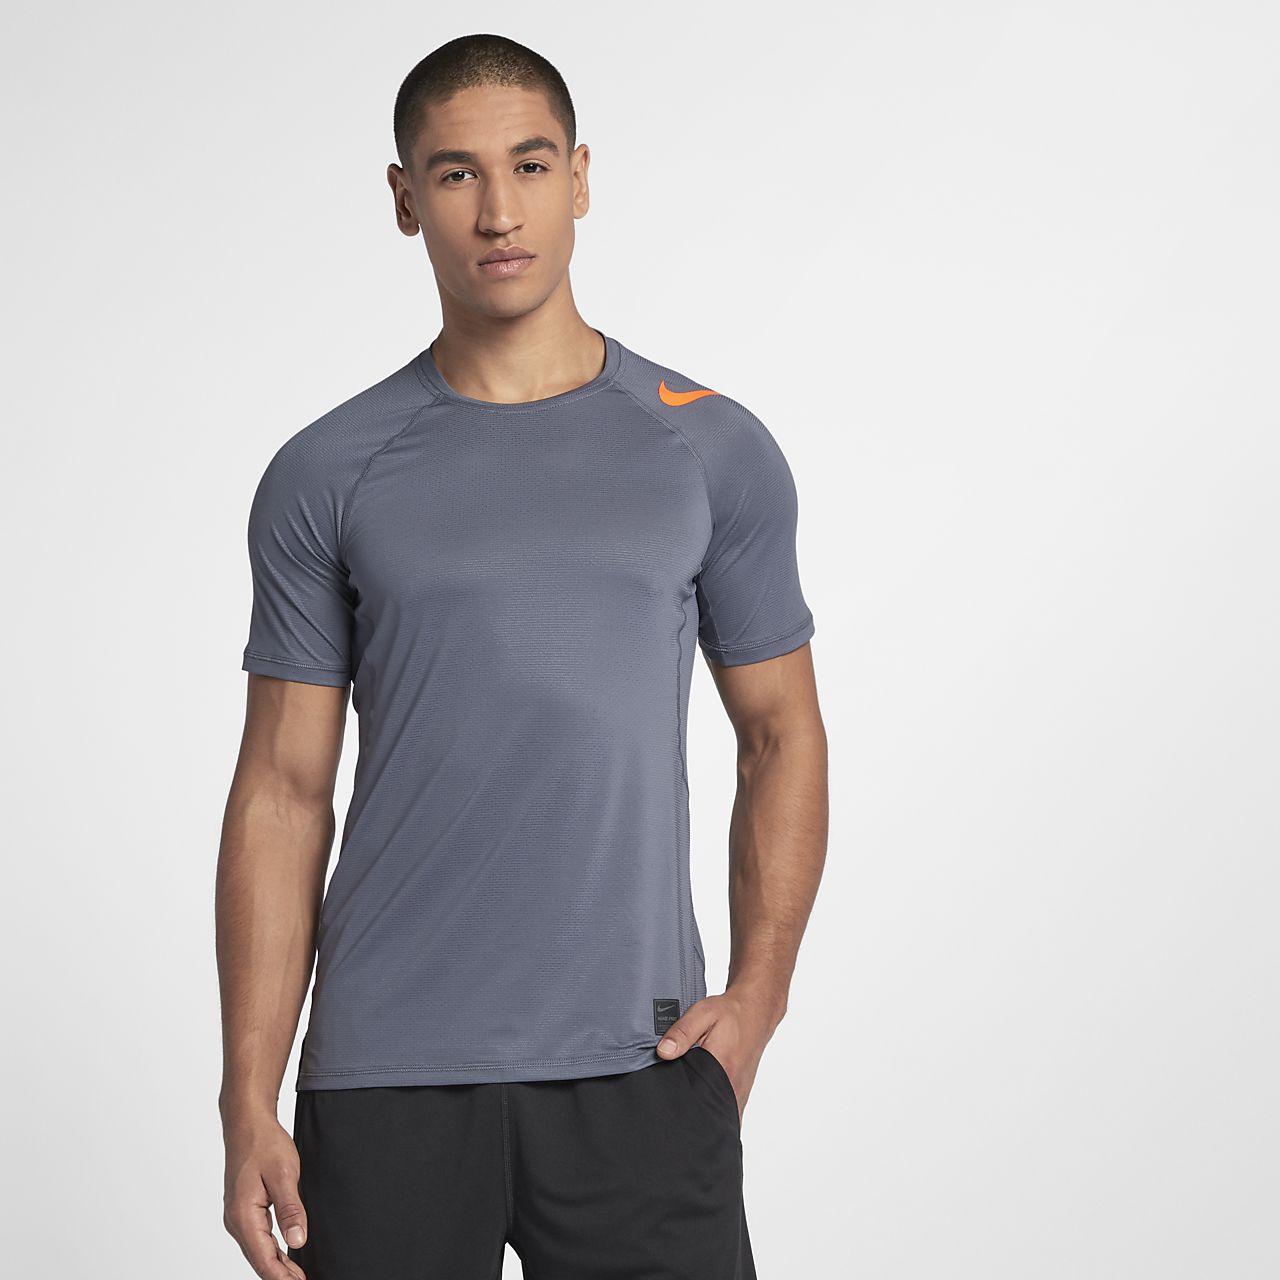 ... Nike Pro HyperCool Men's Short-Sleeve Training Top